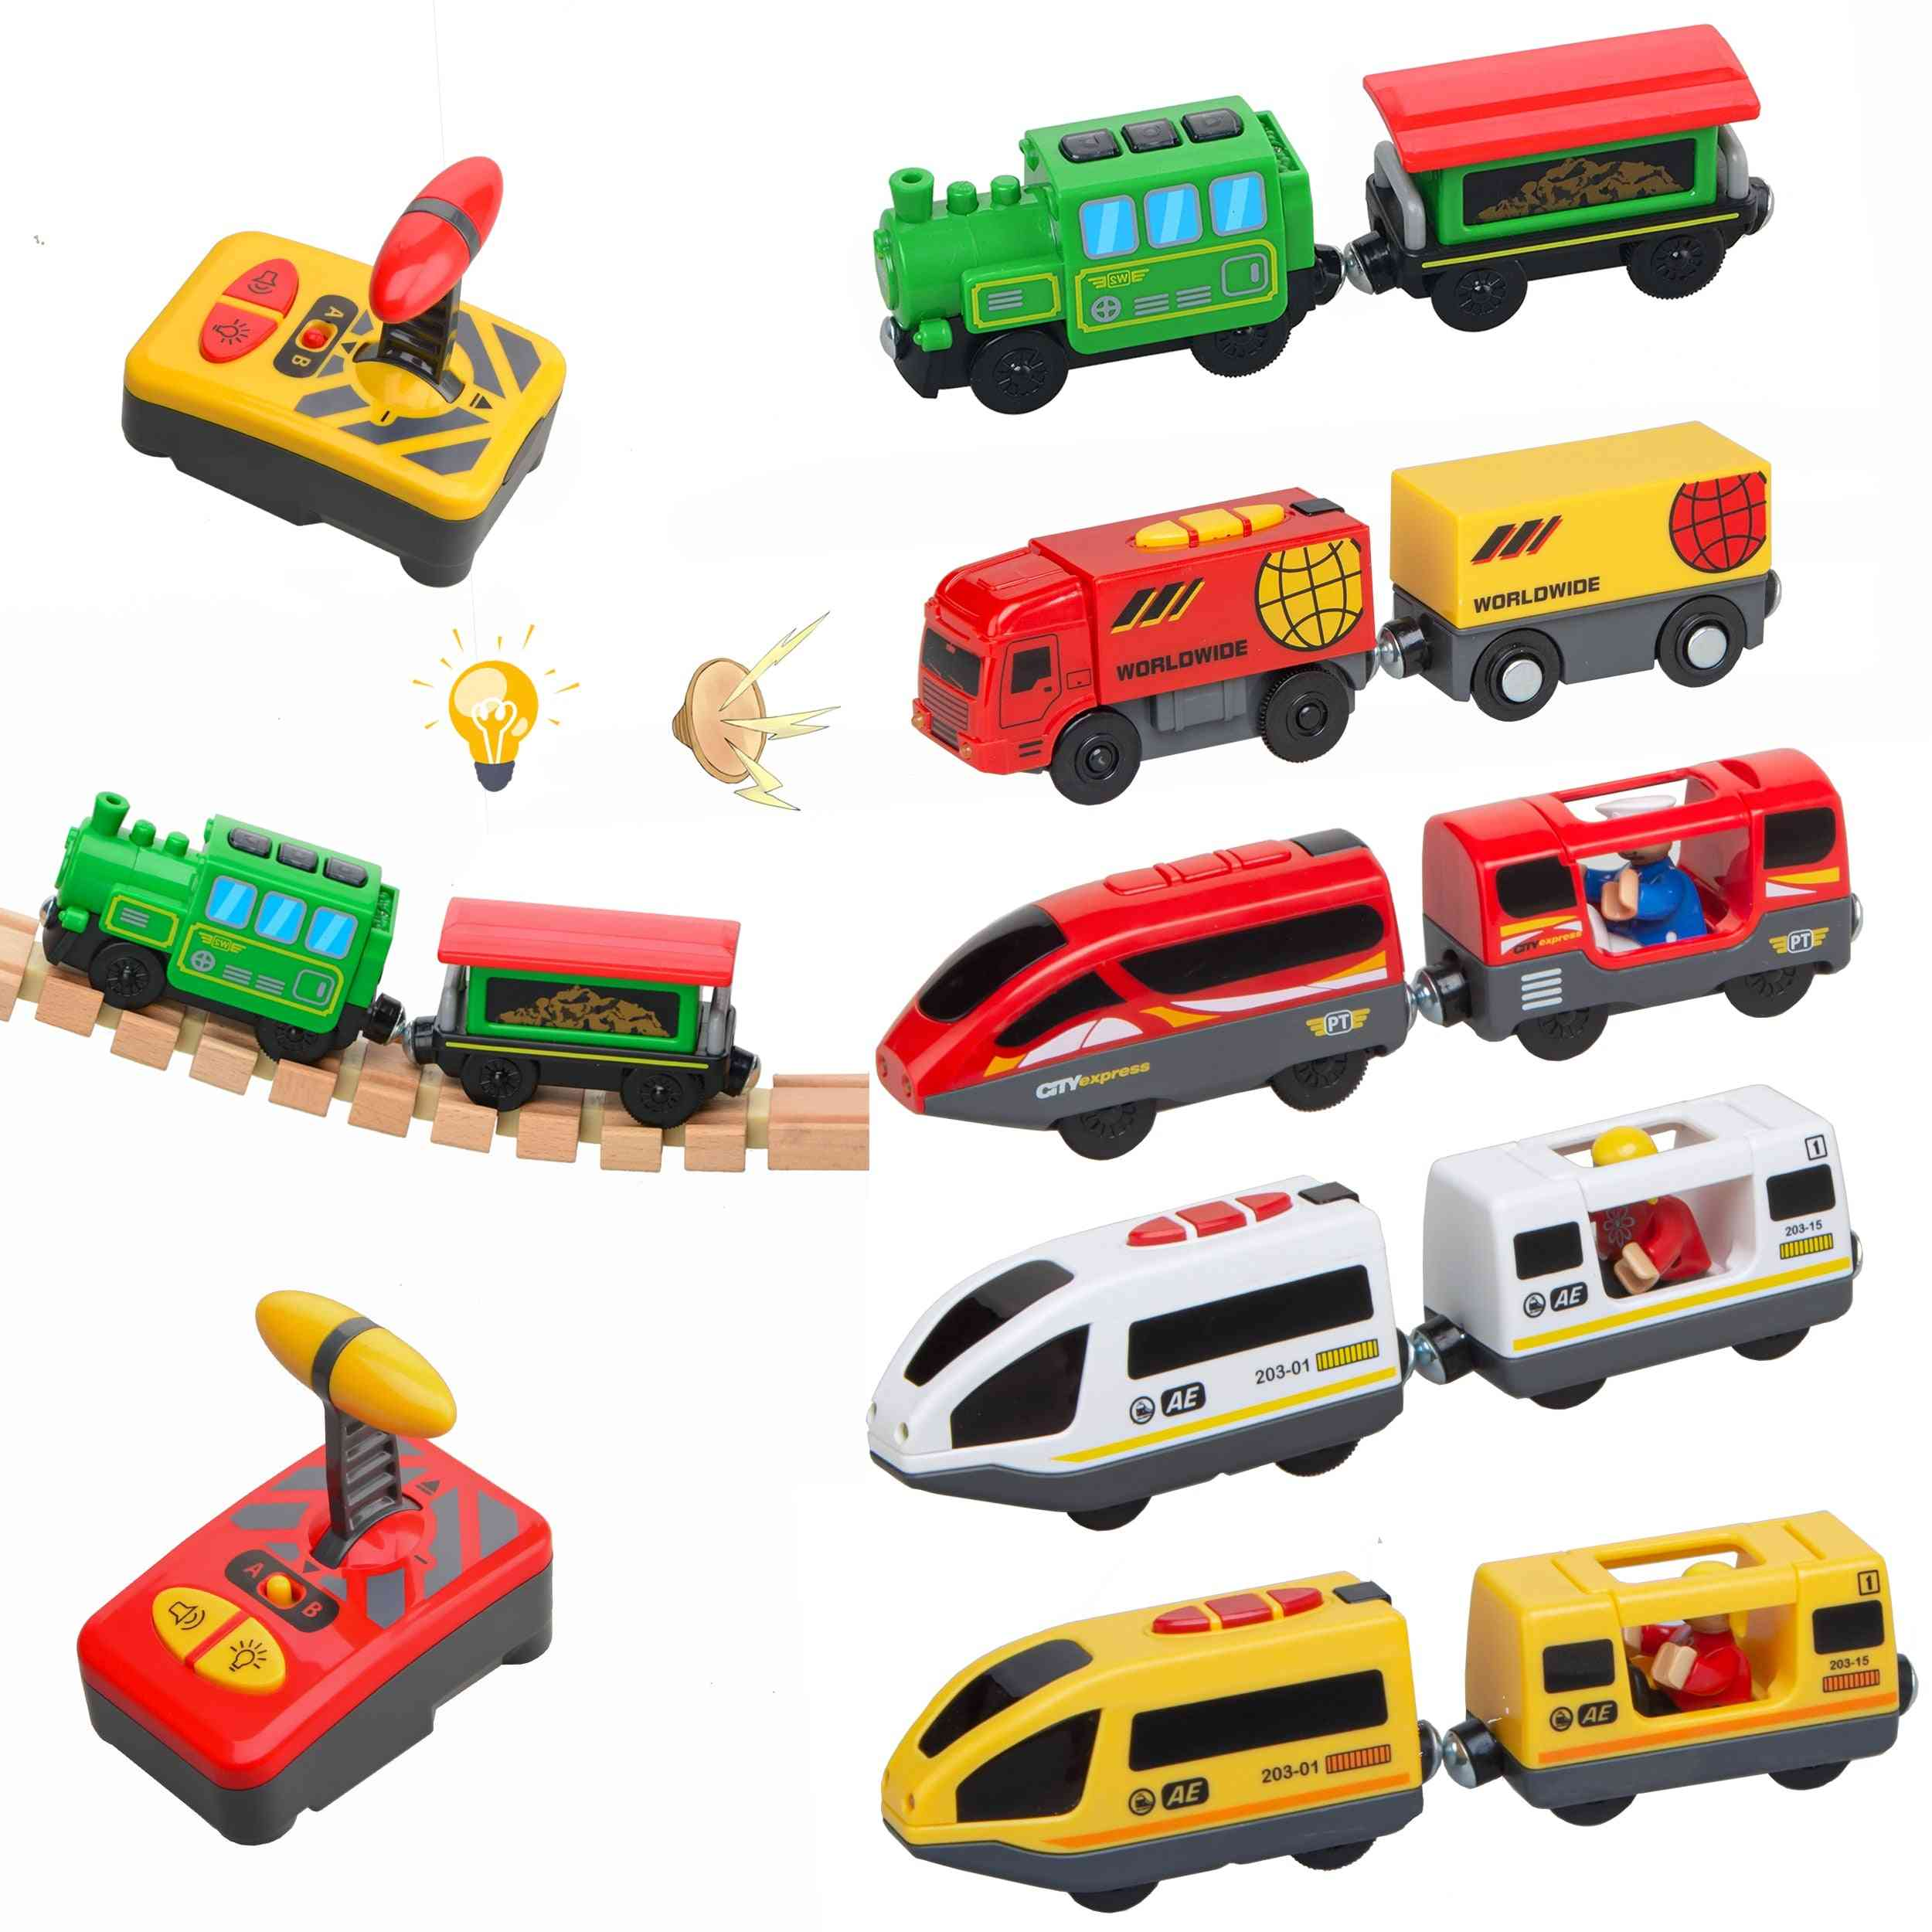 Remote Control Electric Train Toy Set